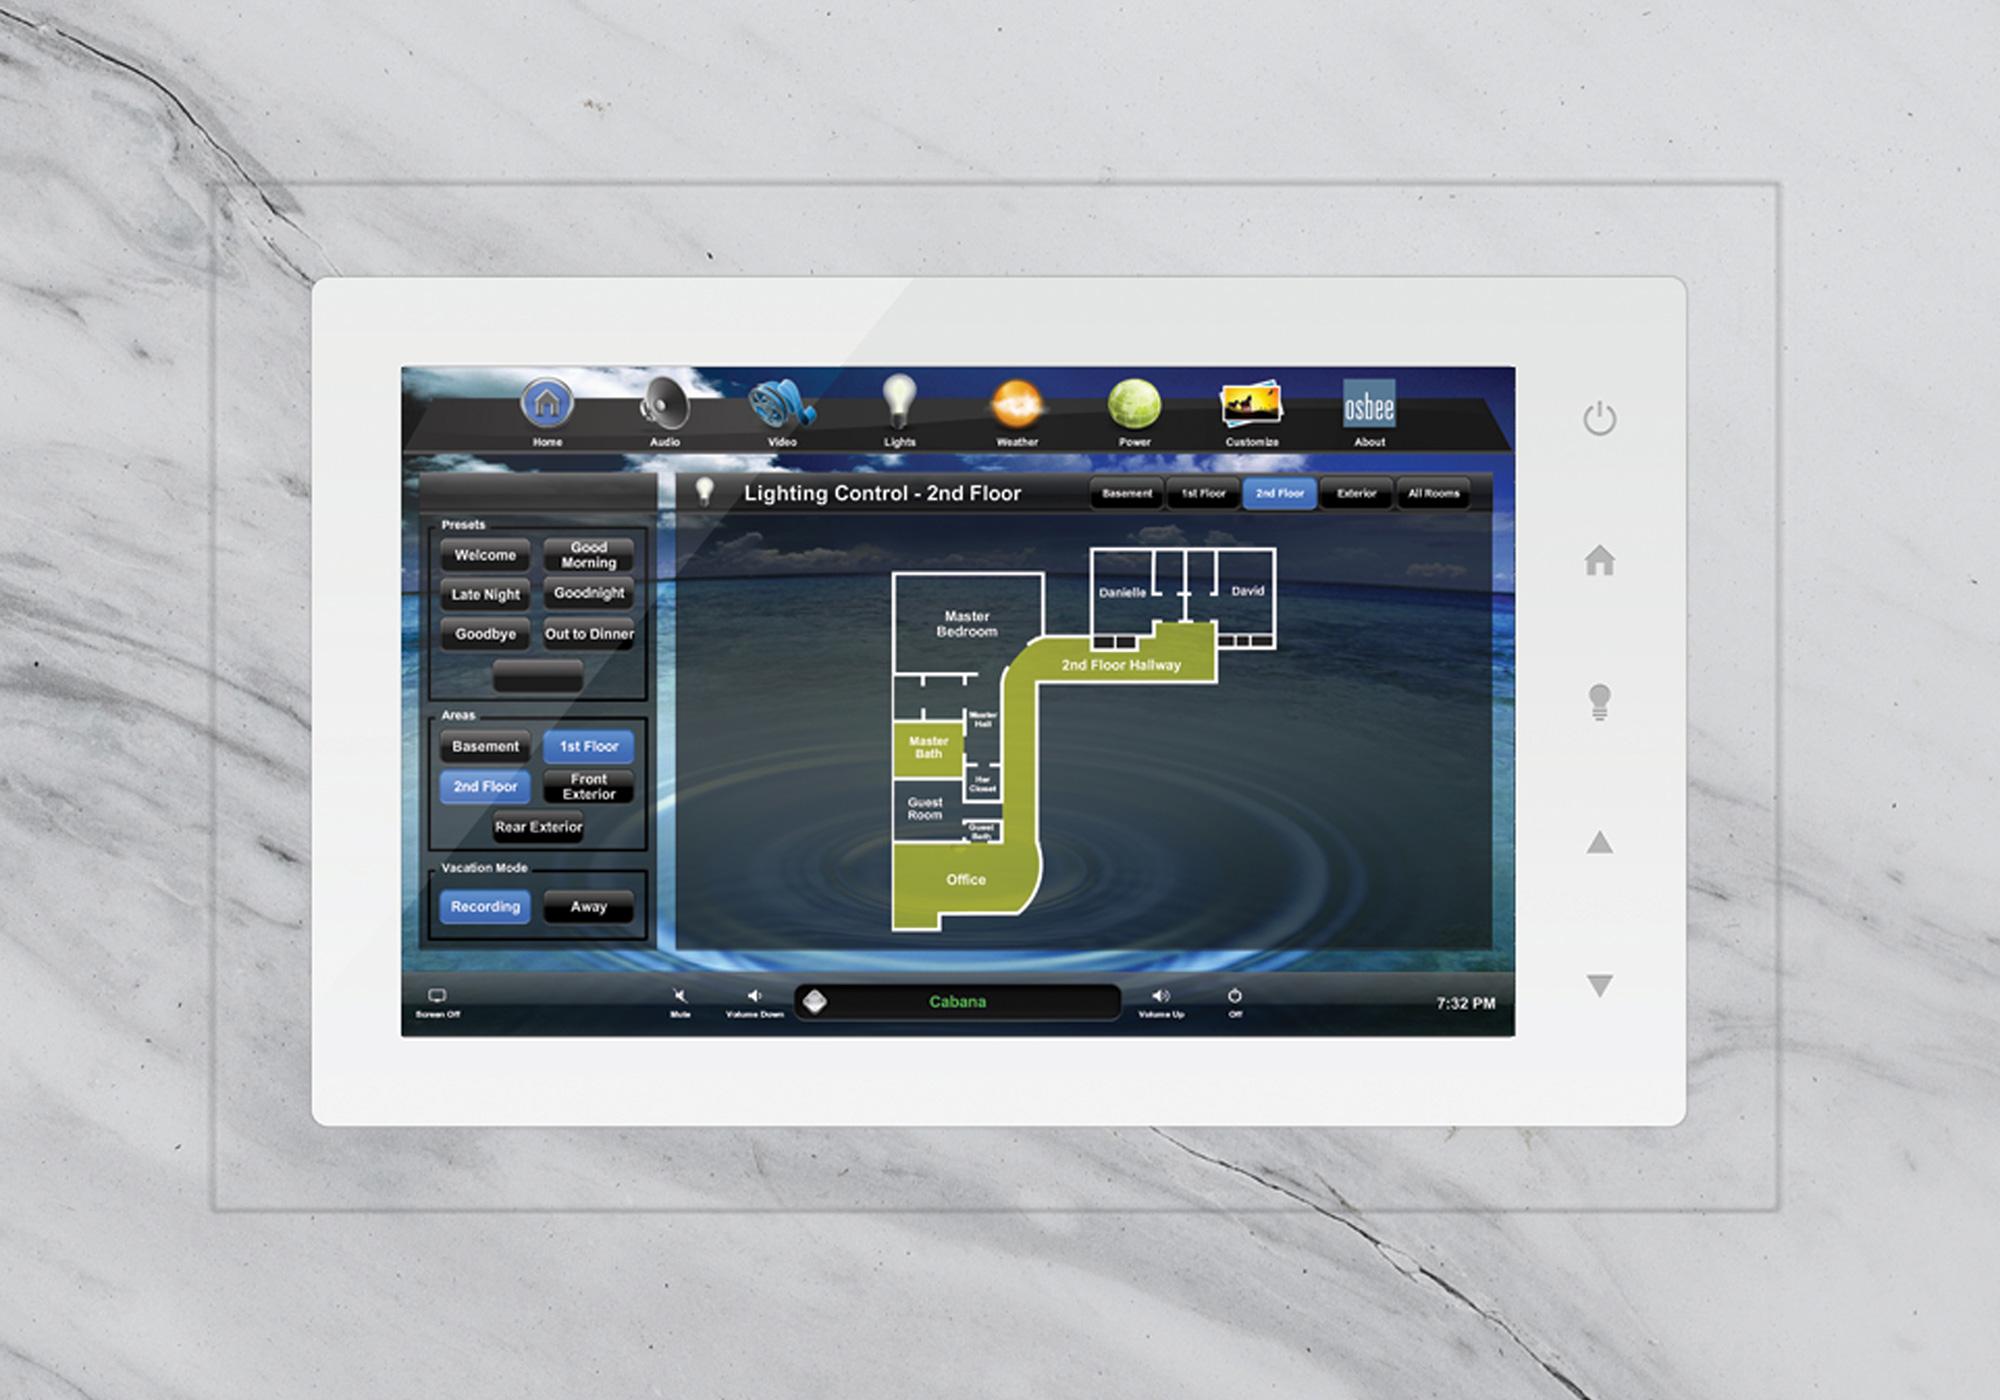 TruFig, flush-mount, touchscreen, wall-mount, marble, stone, lighting screen